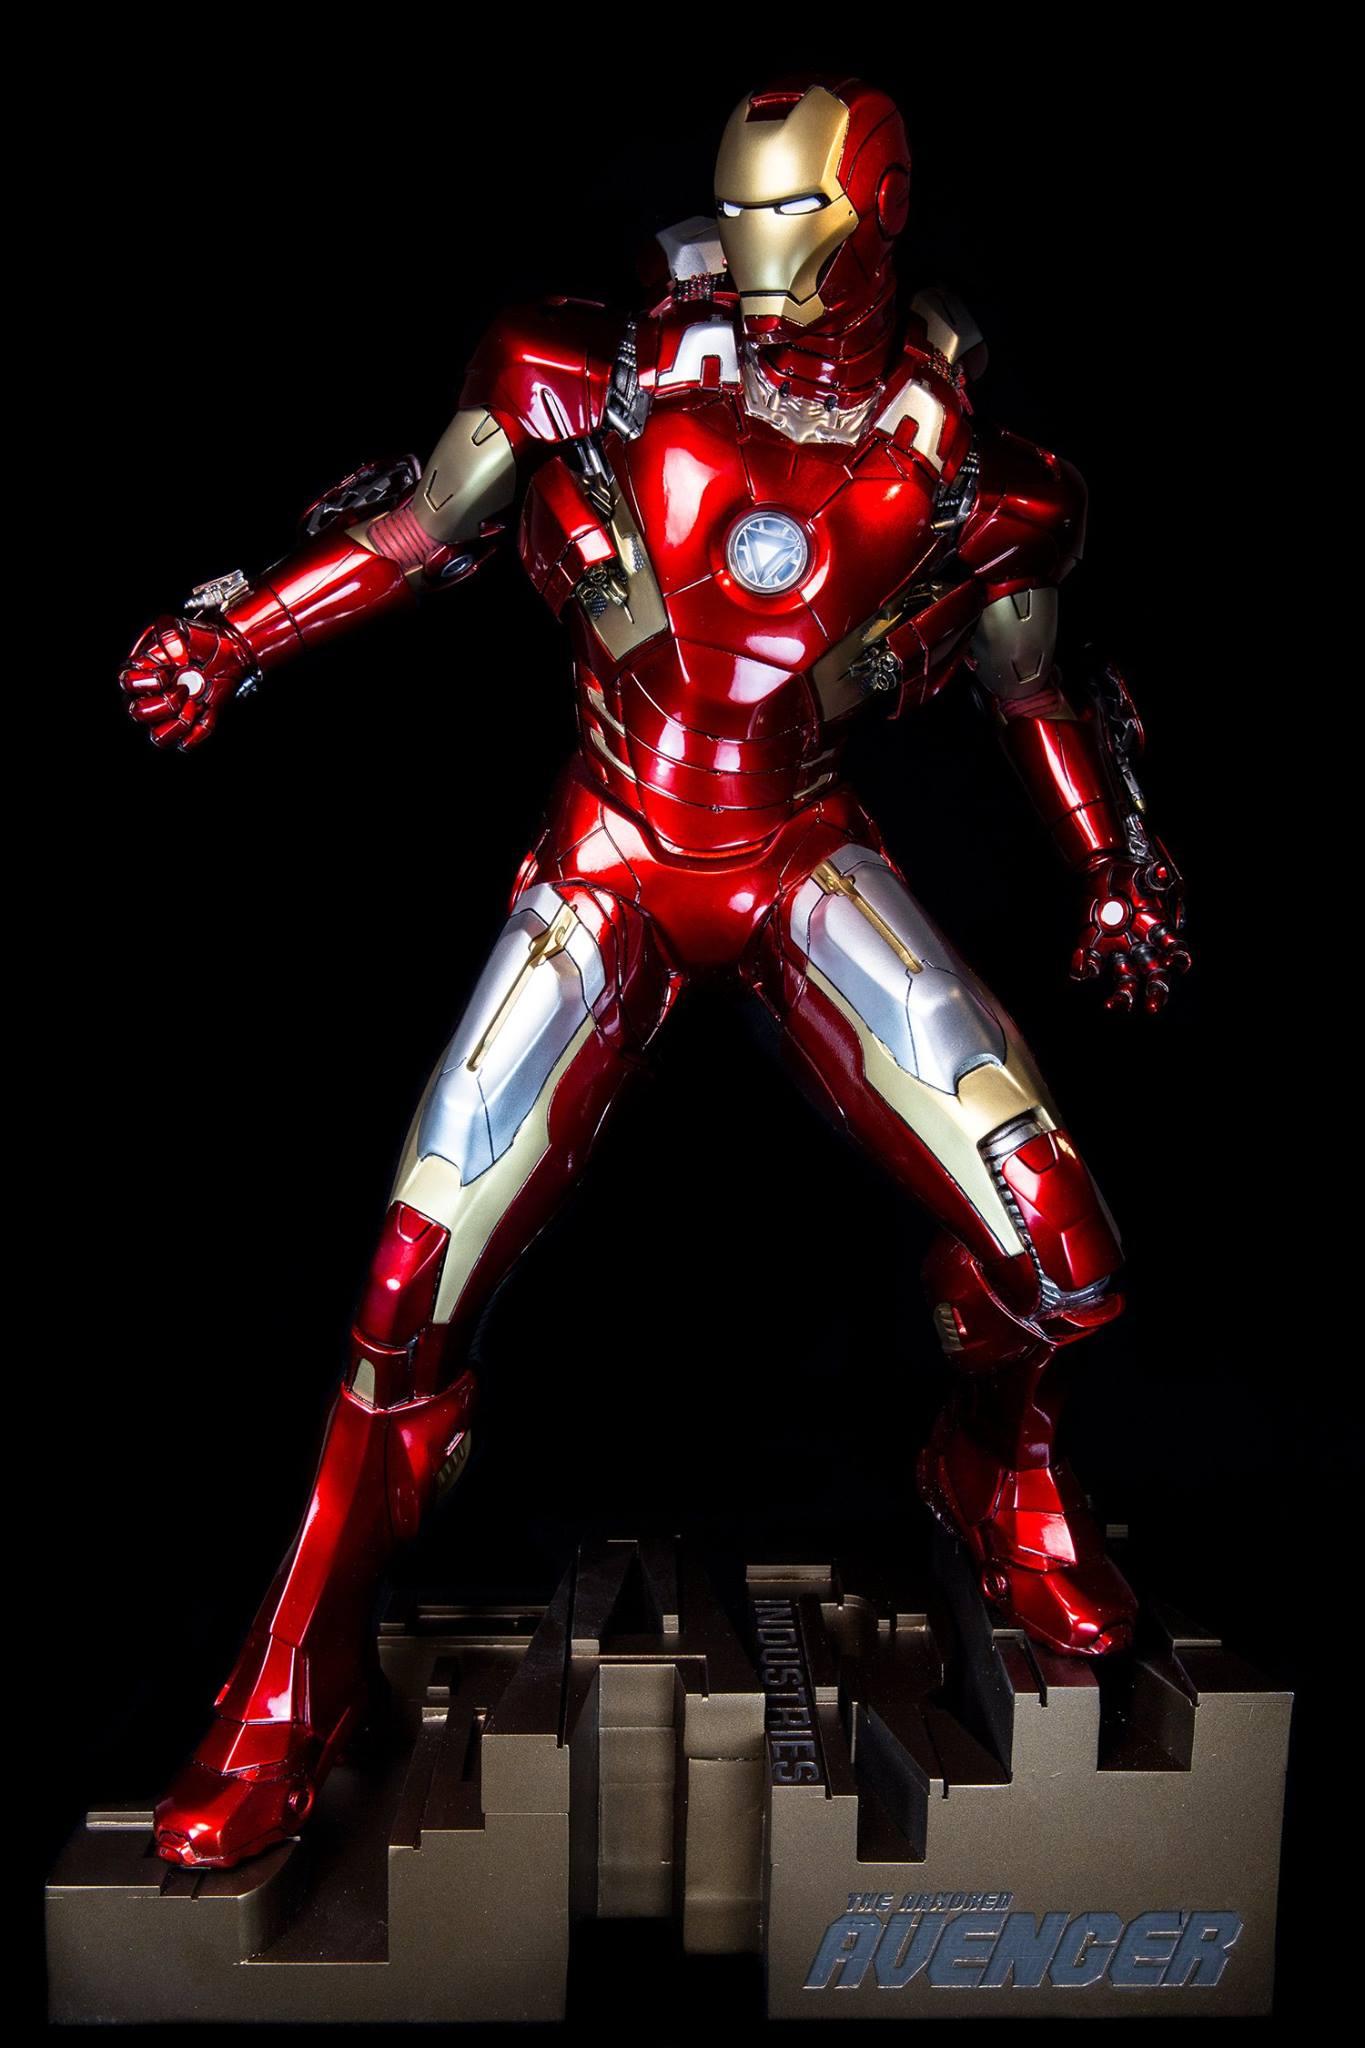 Premium Collectibles : Iron man MK VII - Page 2 3788501054807114035865698620382800706652483111931o